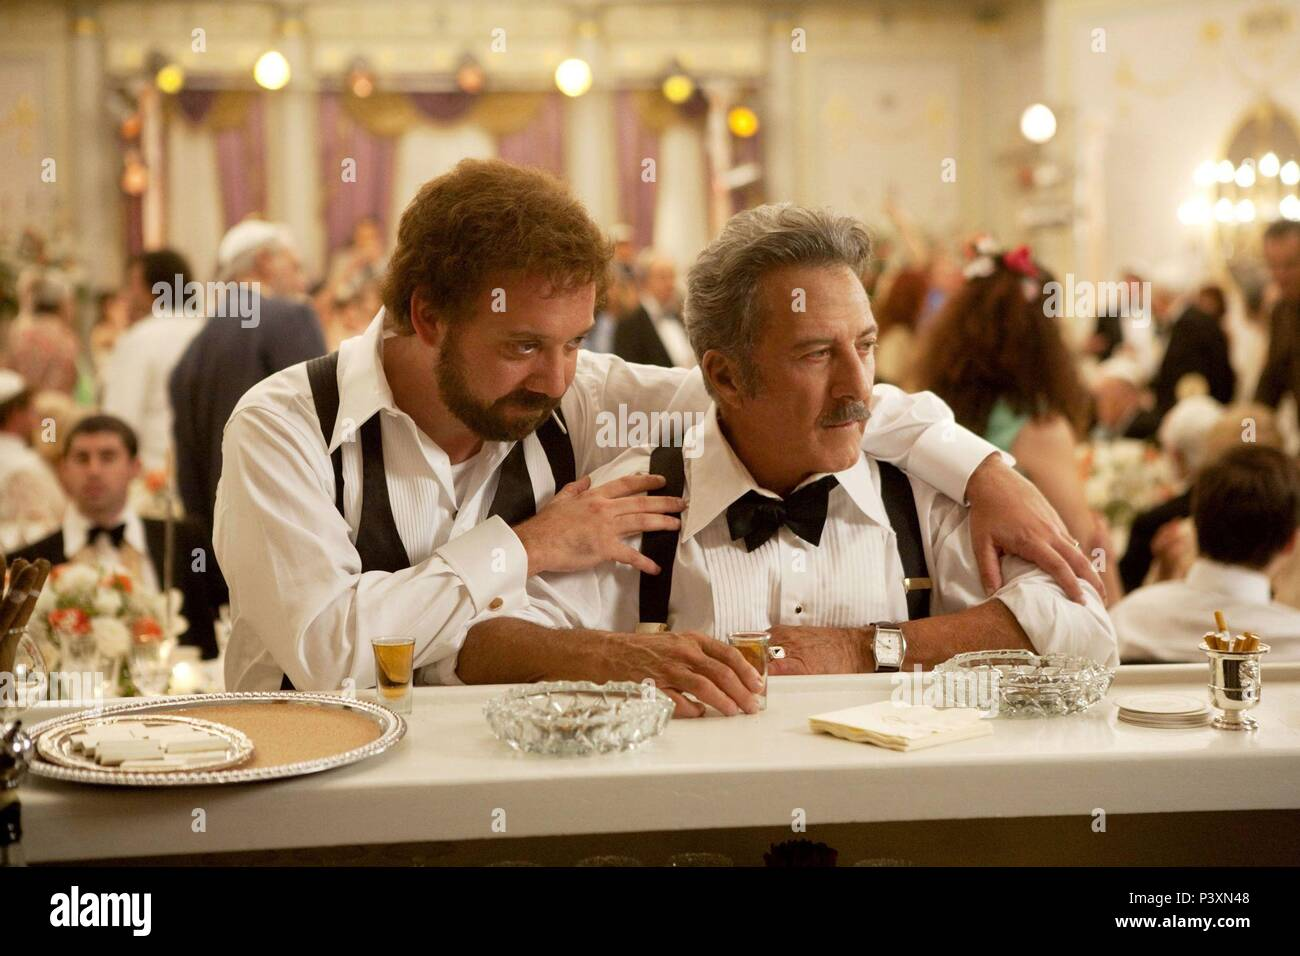 Original Film Title: BARNEY'S VERSION.  English Title: BARNEY'S VERSION.  Film Director: RICHARD J. LEWIS.  Year: 2010.  Stars: DUSTIN HOFFMAN; PAUL GIAMATTI. Credit: SERENDIPITY POINT FILMS / Album - Stock Image